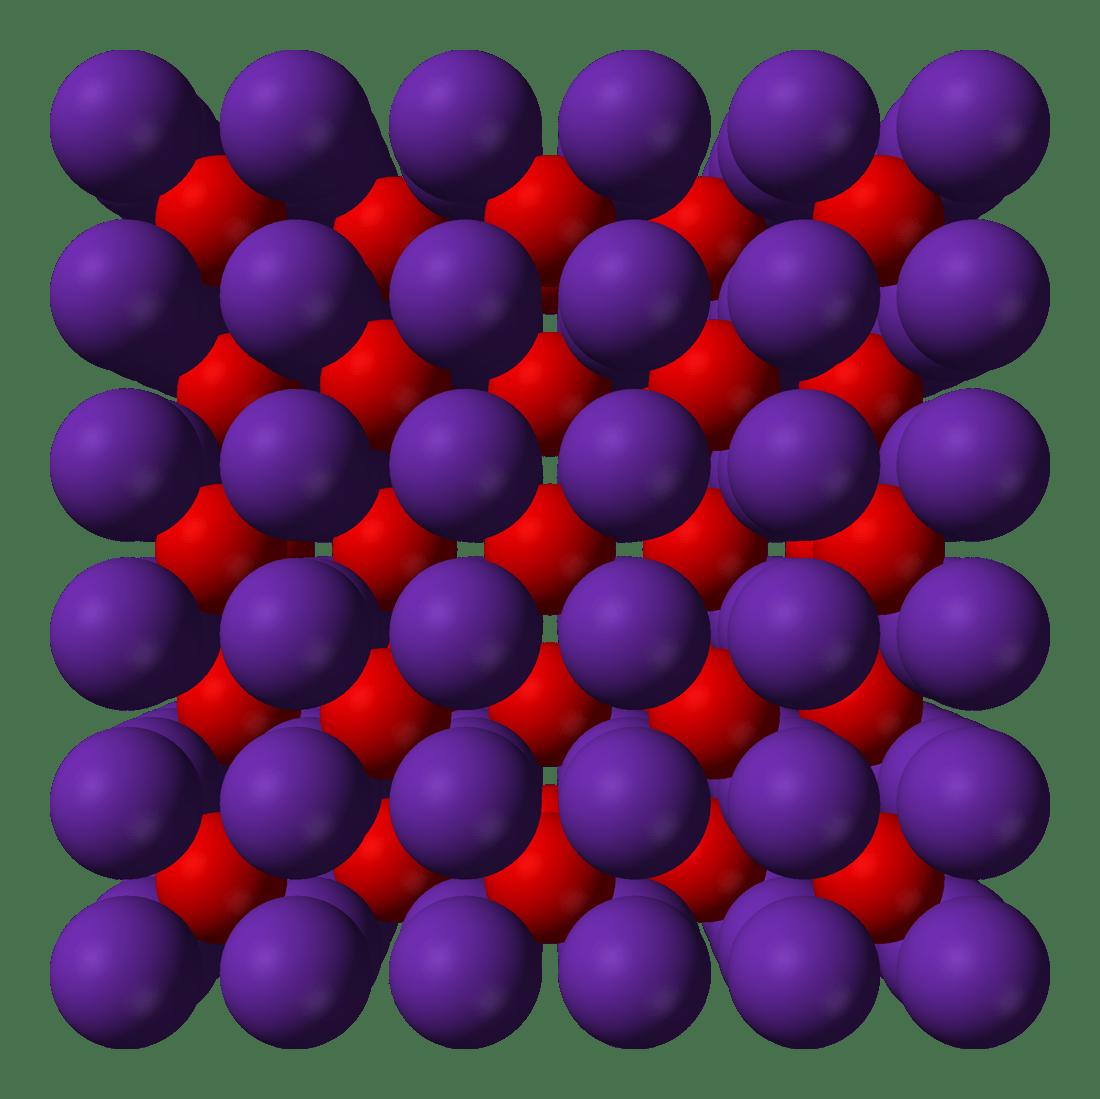 sodium oxide ionic bonding diagram vip722 dvr wiring rubidium wikipedia